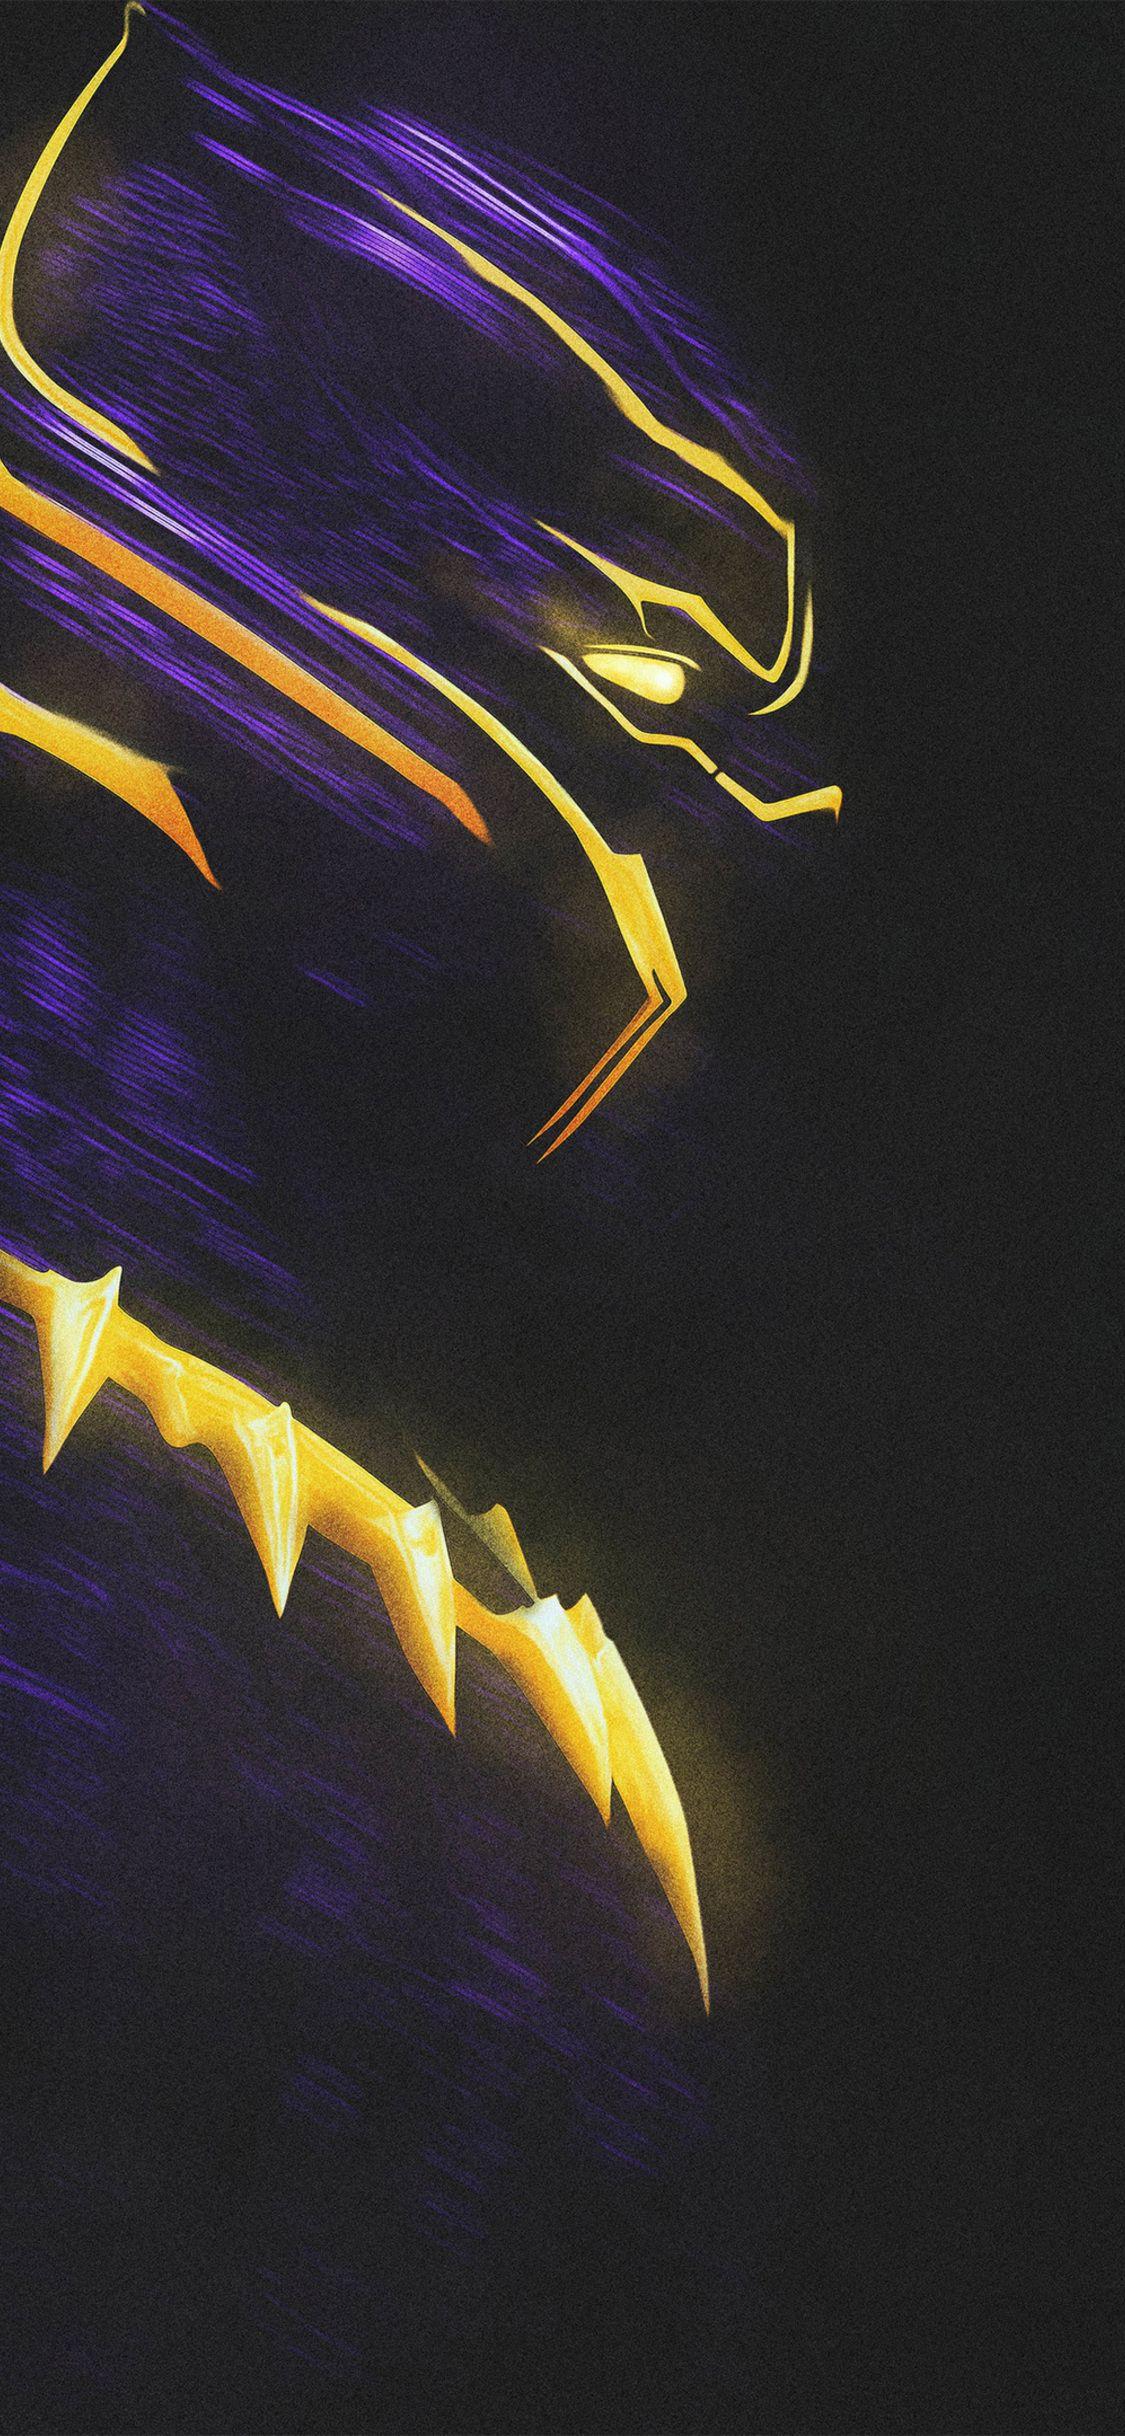 Desktophdwallpaper Org Black Panther Art Panther Art Black Panther Hd Wallpaper